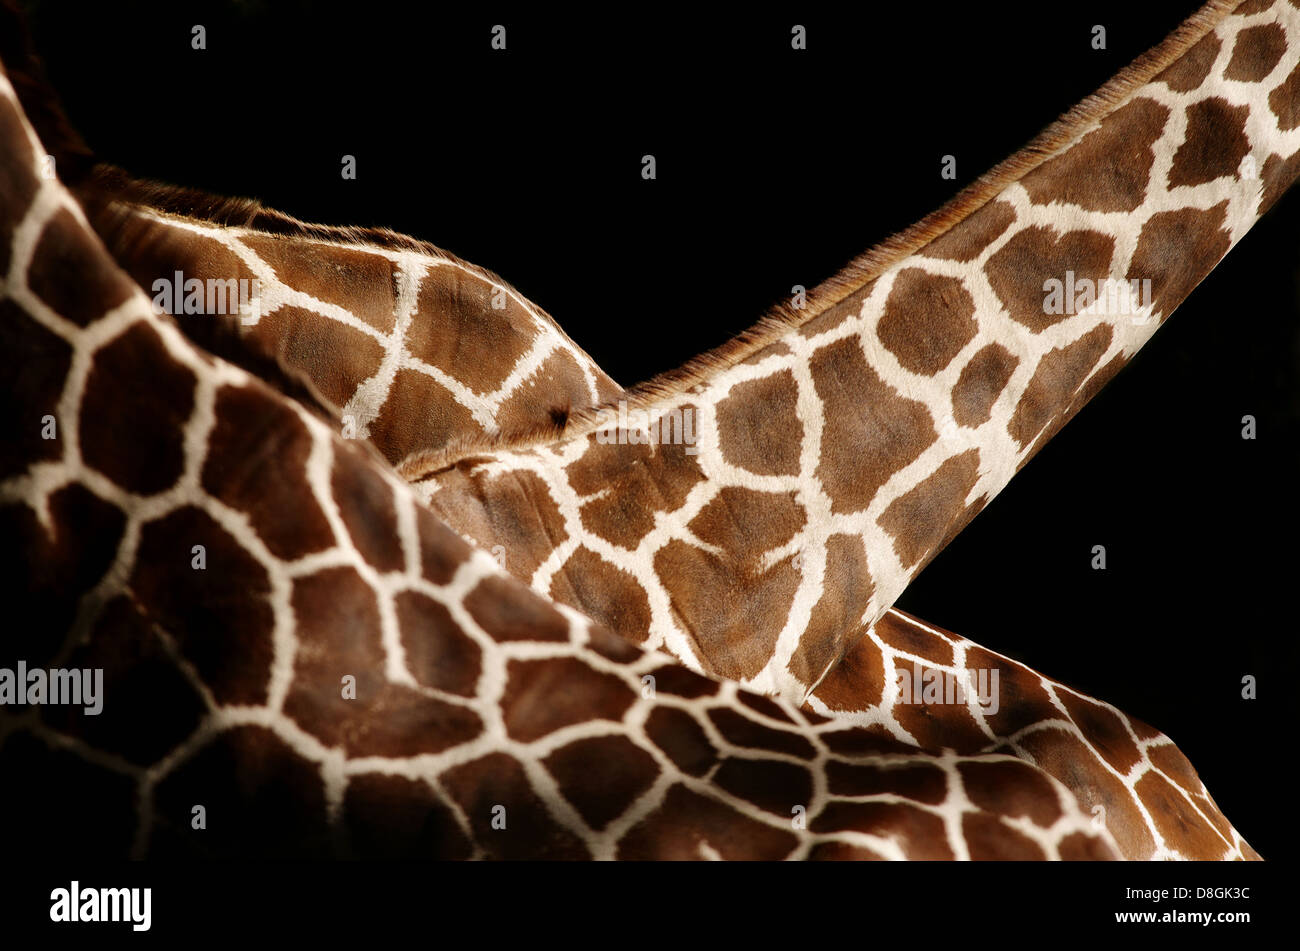 3 Girafes somaliens Banque D'Images